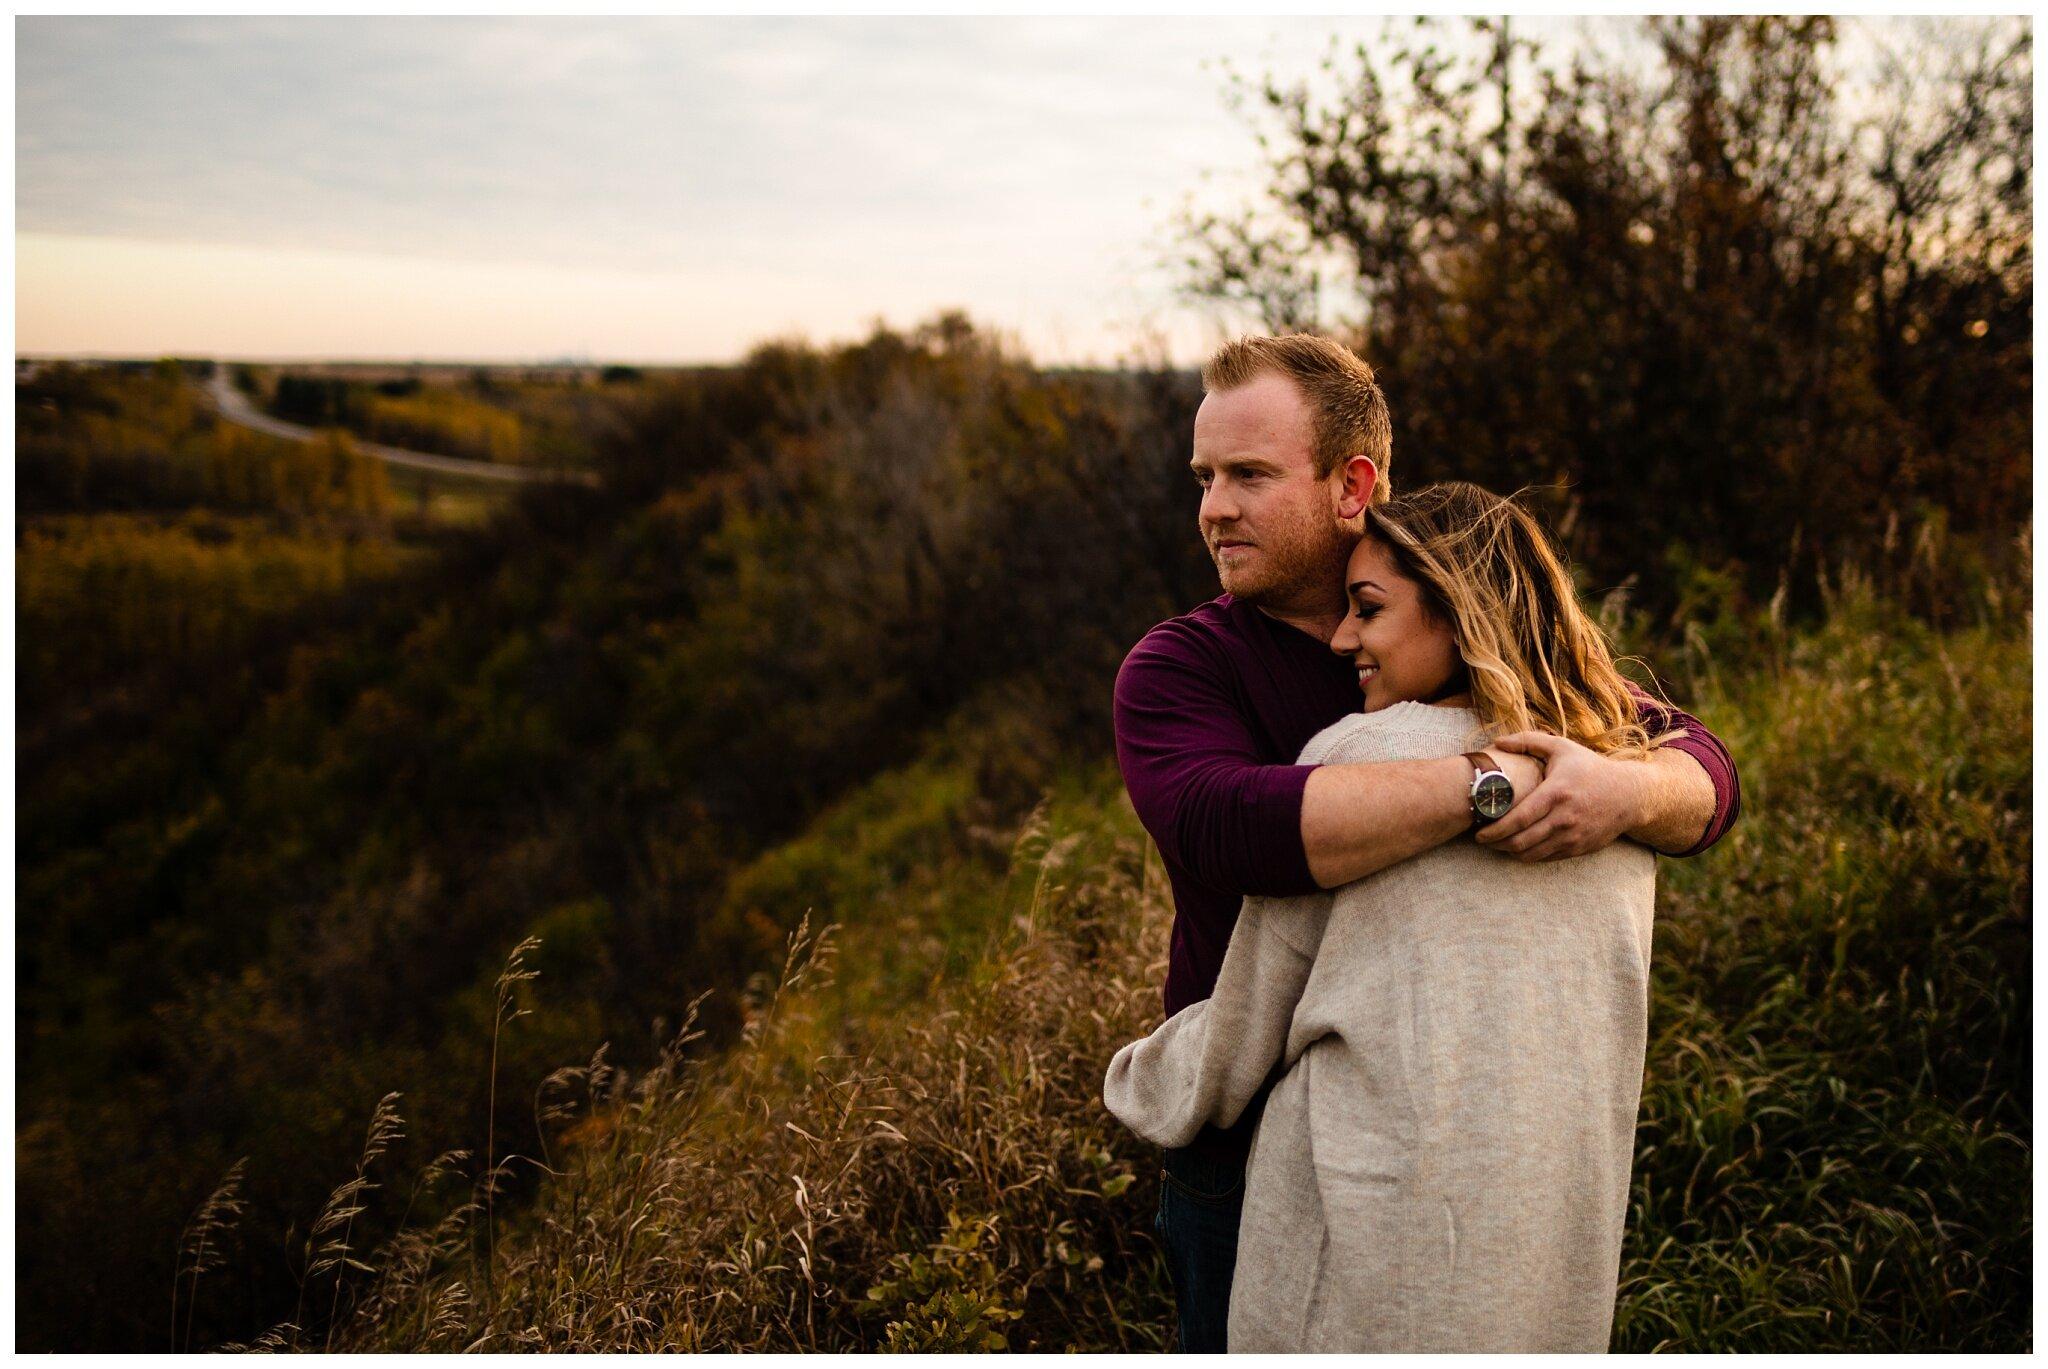 Edmonton Engagement Photographer Romantic Couples Photos Local YEG Strathcona County_0002.jpg